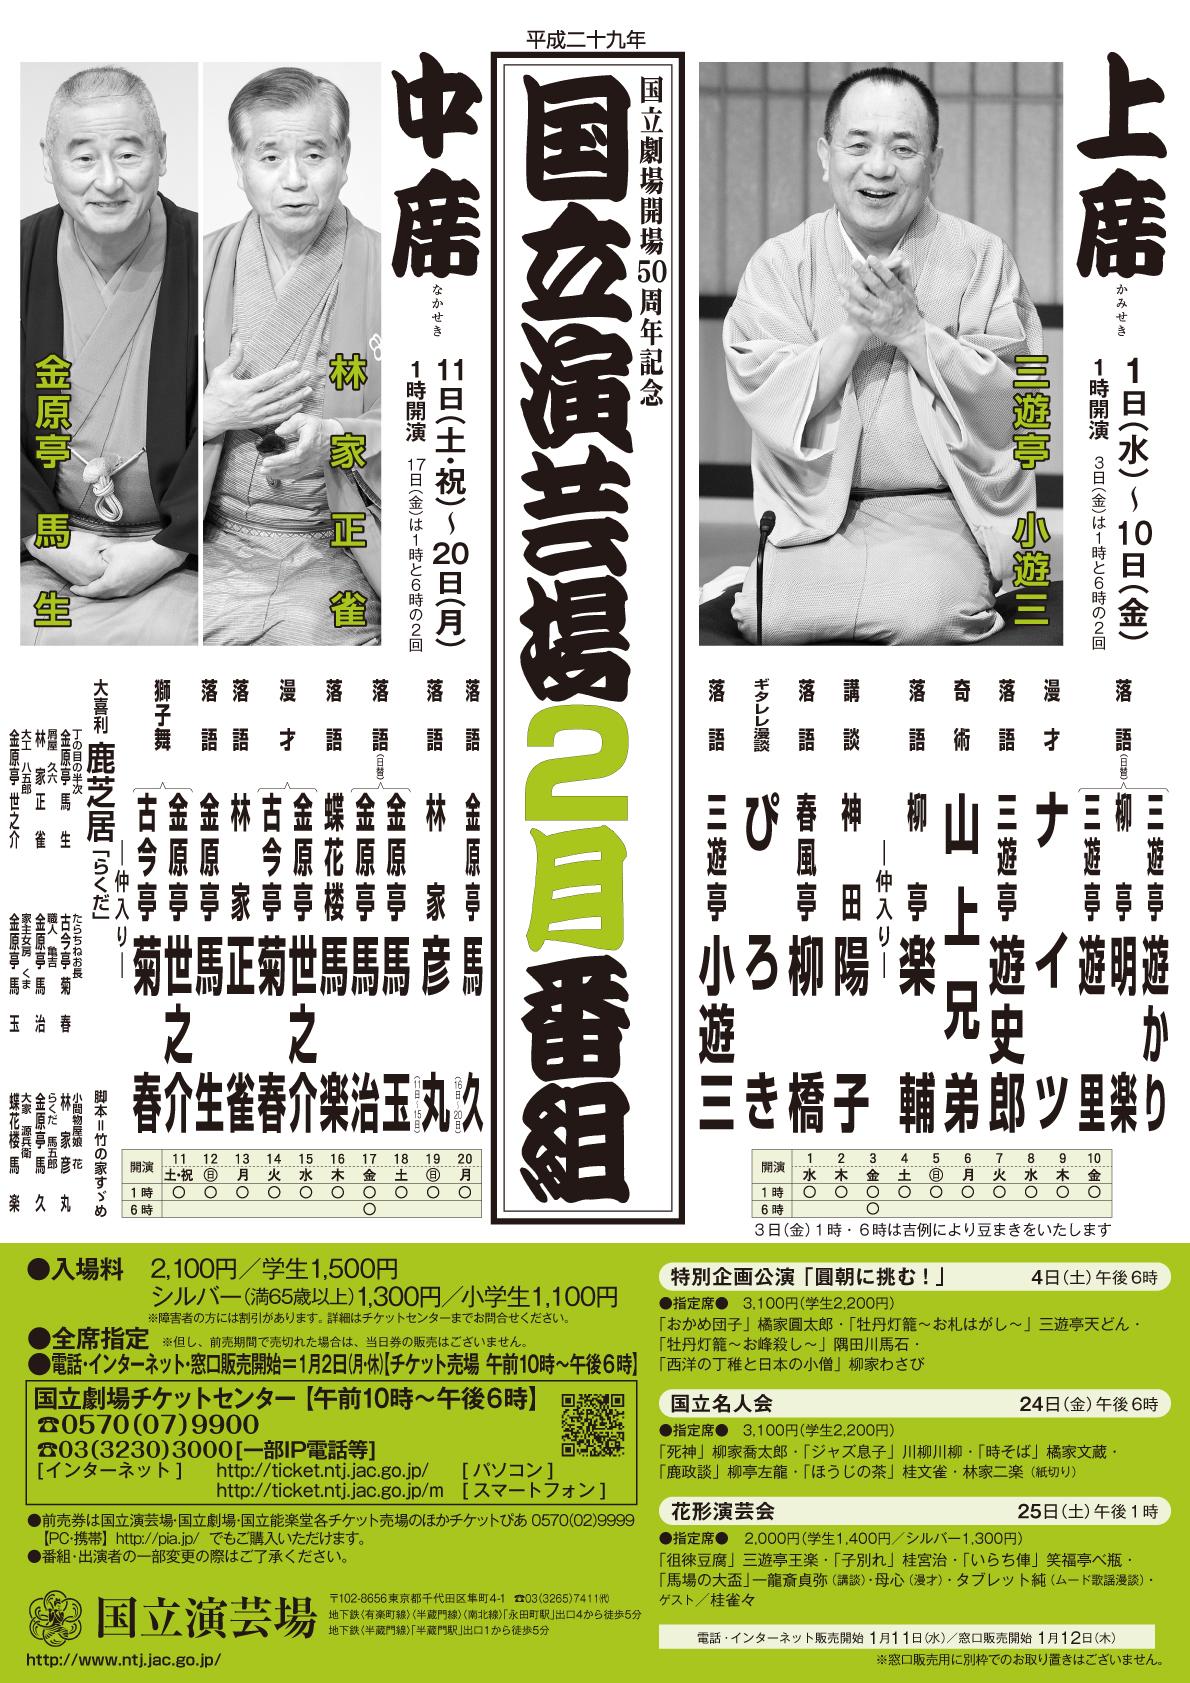 http://www.ntj.jac.go.jp/assets/images/engei/leaflet/2902kaminaka.jpg